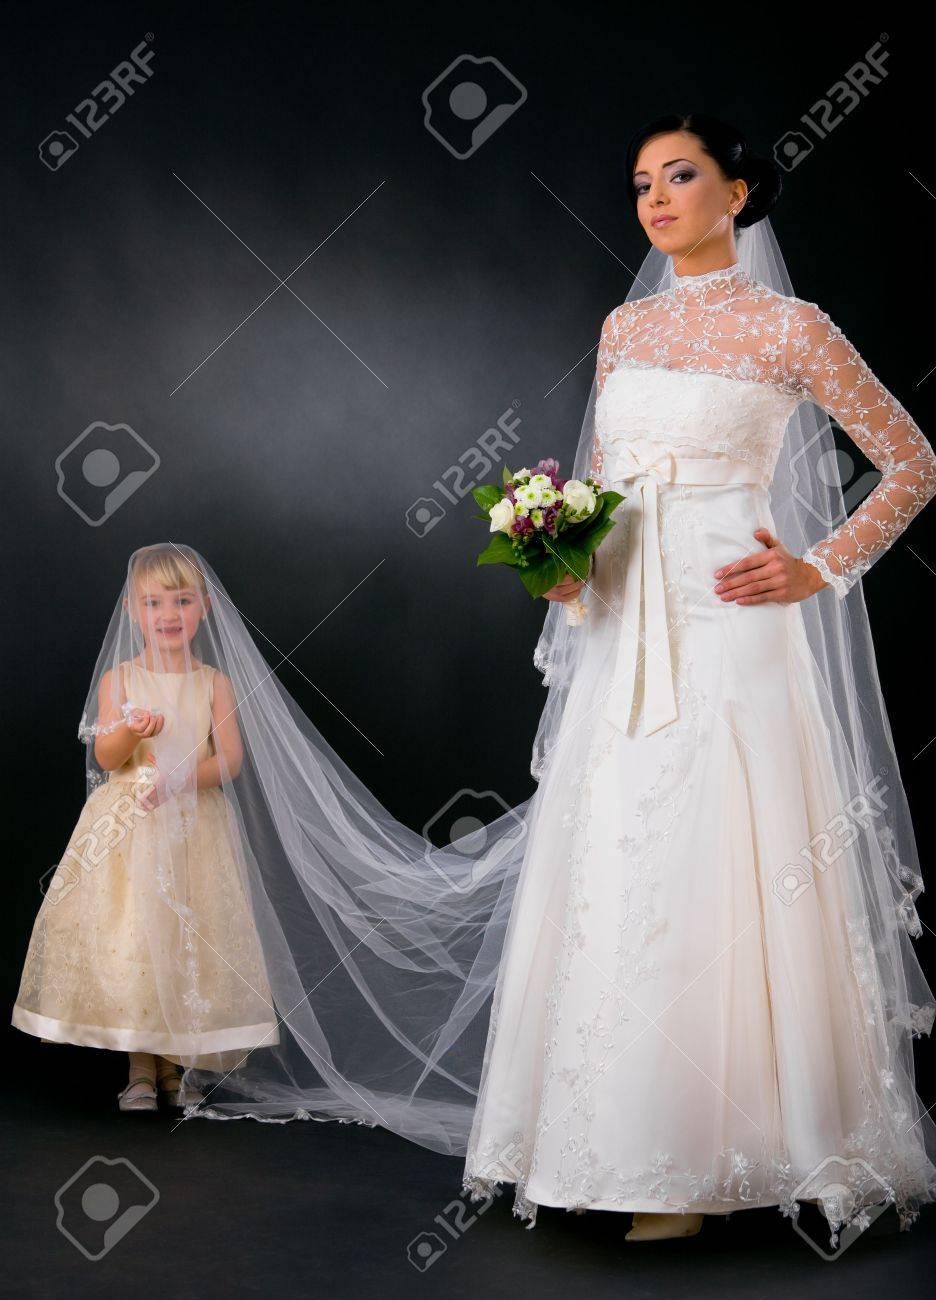 Bride Posing In Romantic White Wedding Dress Holding Bouquet